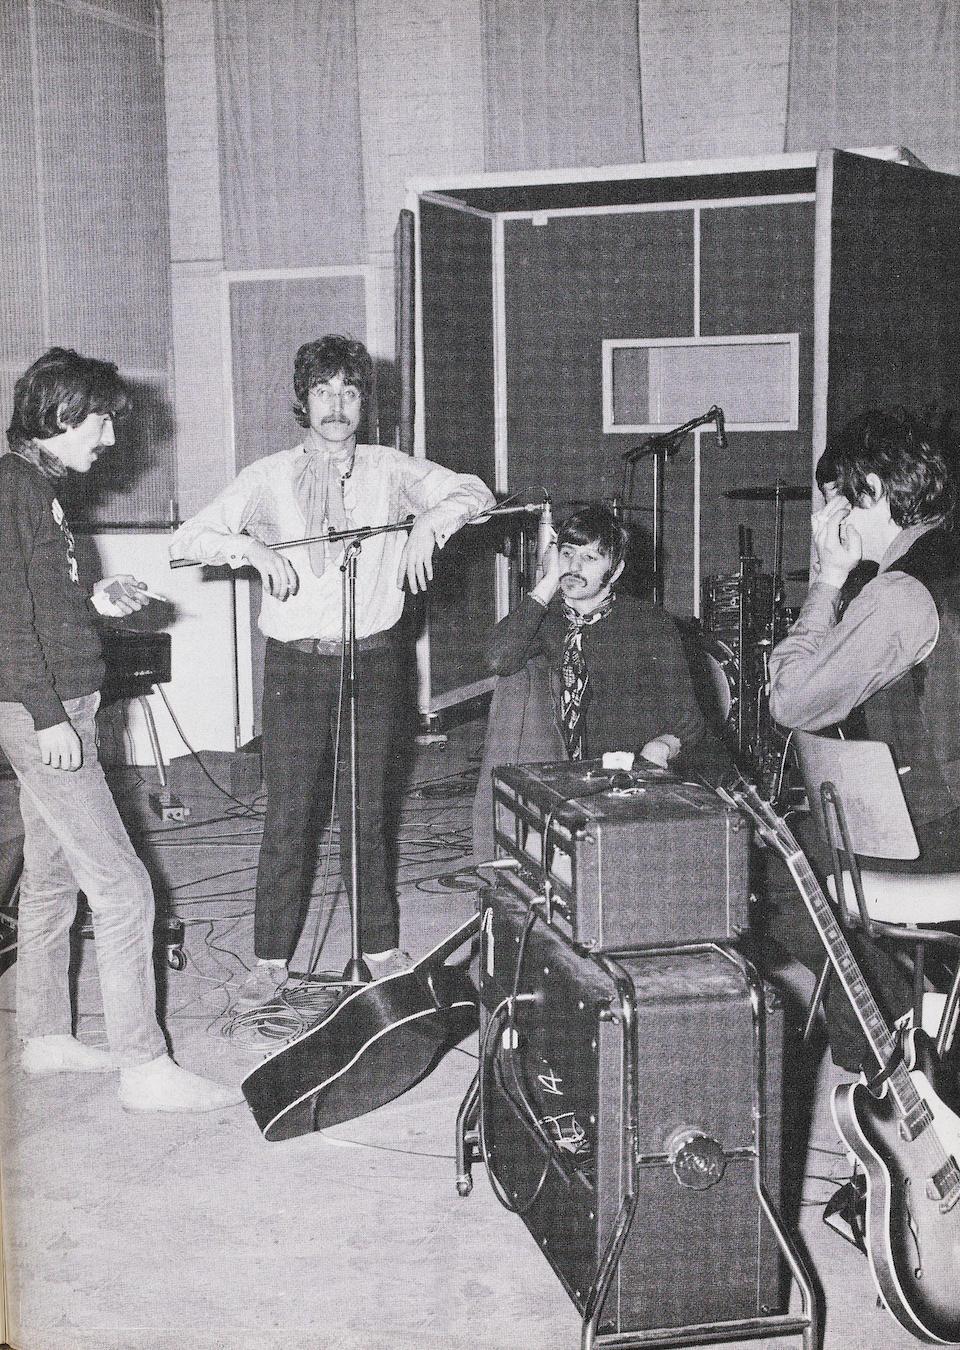 Bonhams : George Harrison/The Beatles: a rare Vox UL730 amplifier